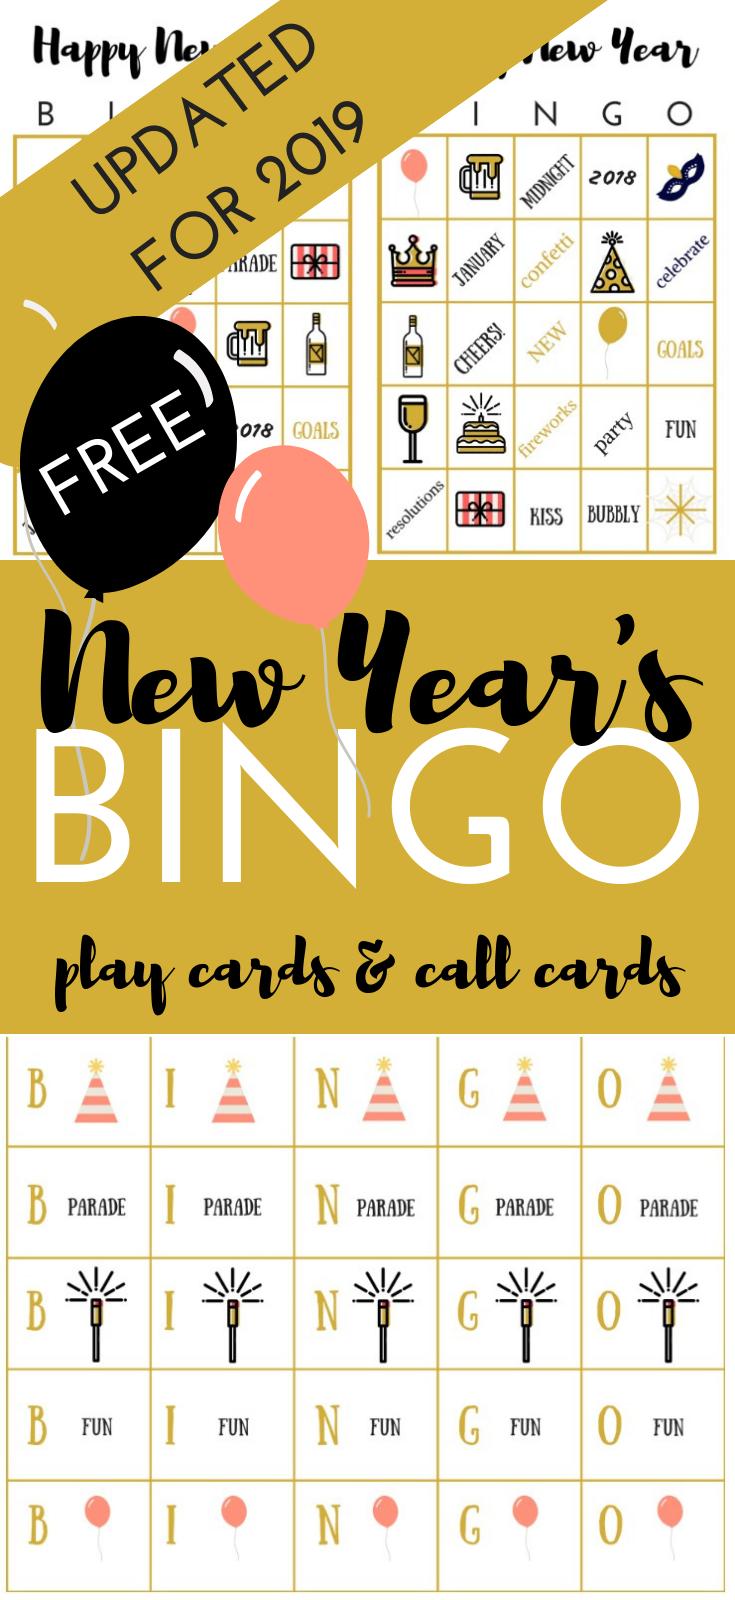 FREE New Year's BINGO Printable Game